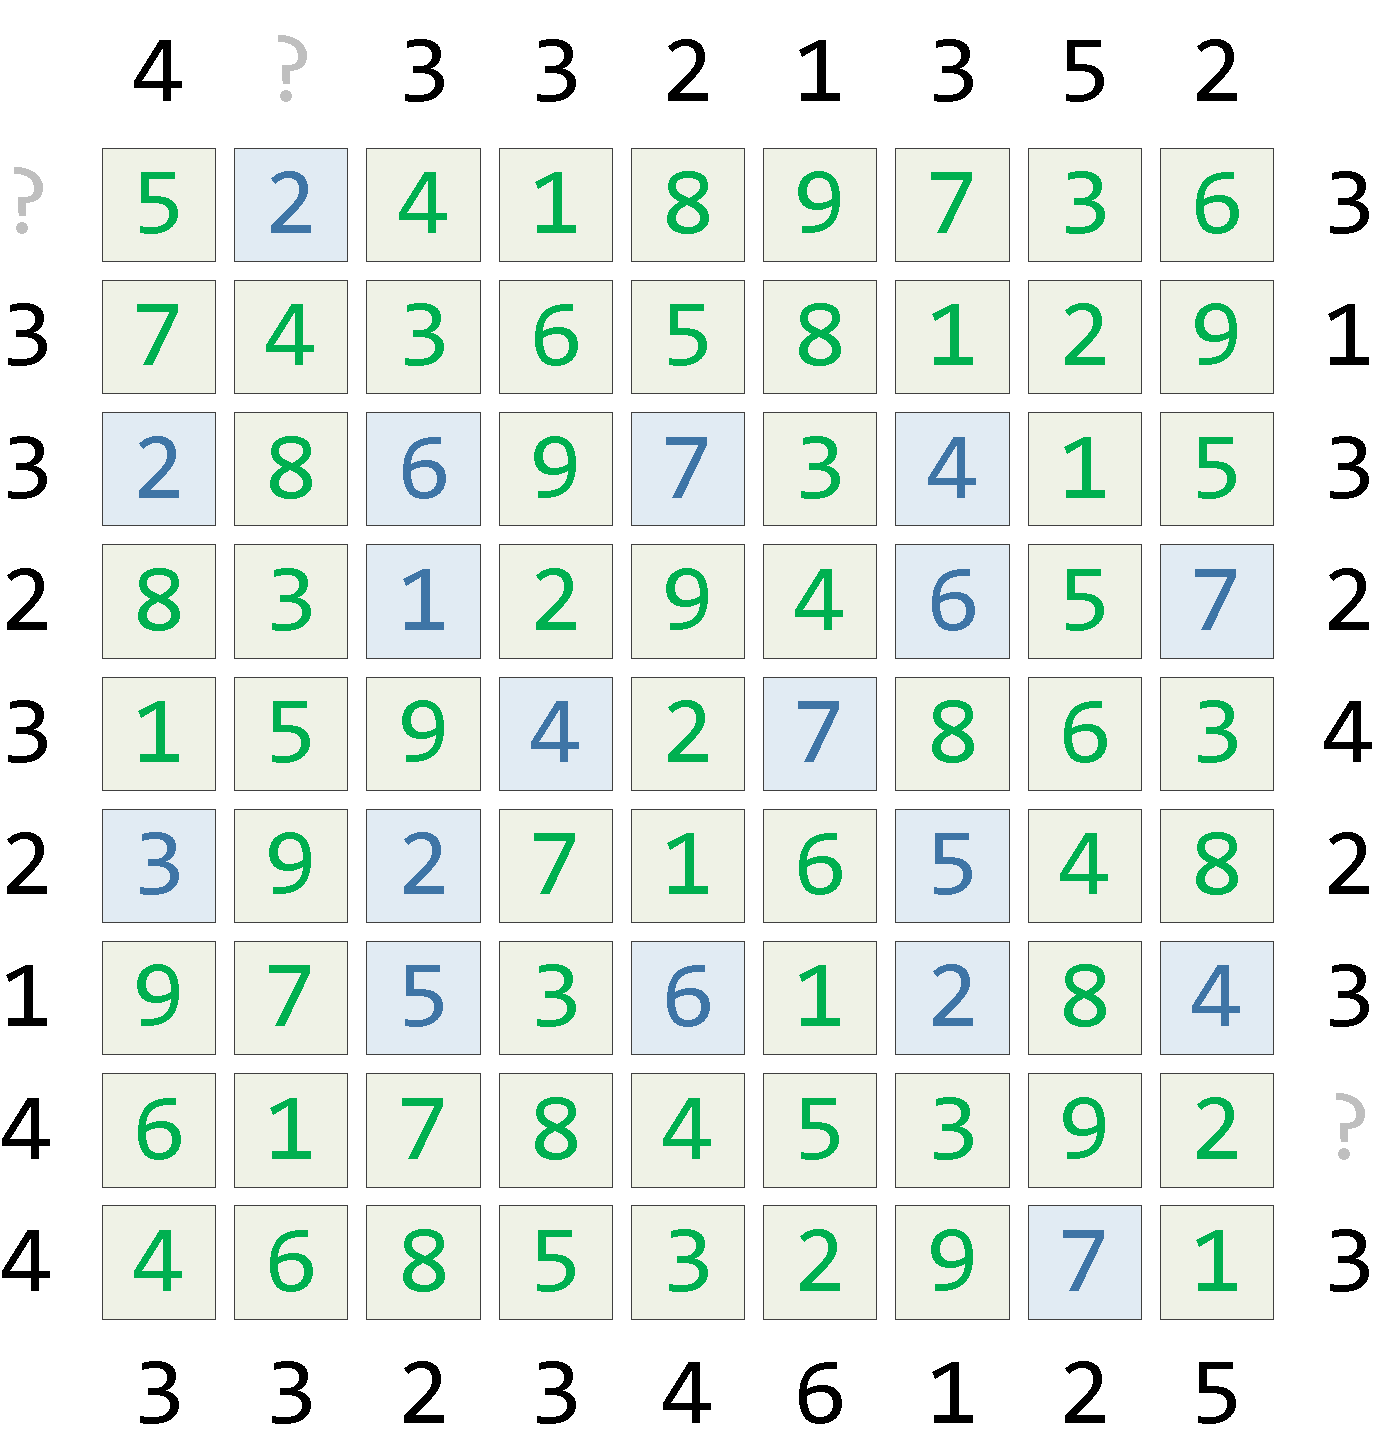 SQL HowTo: решаем головоломку «Небоскрёбы» почти без перебора - 16